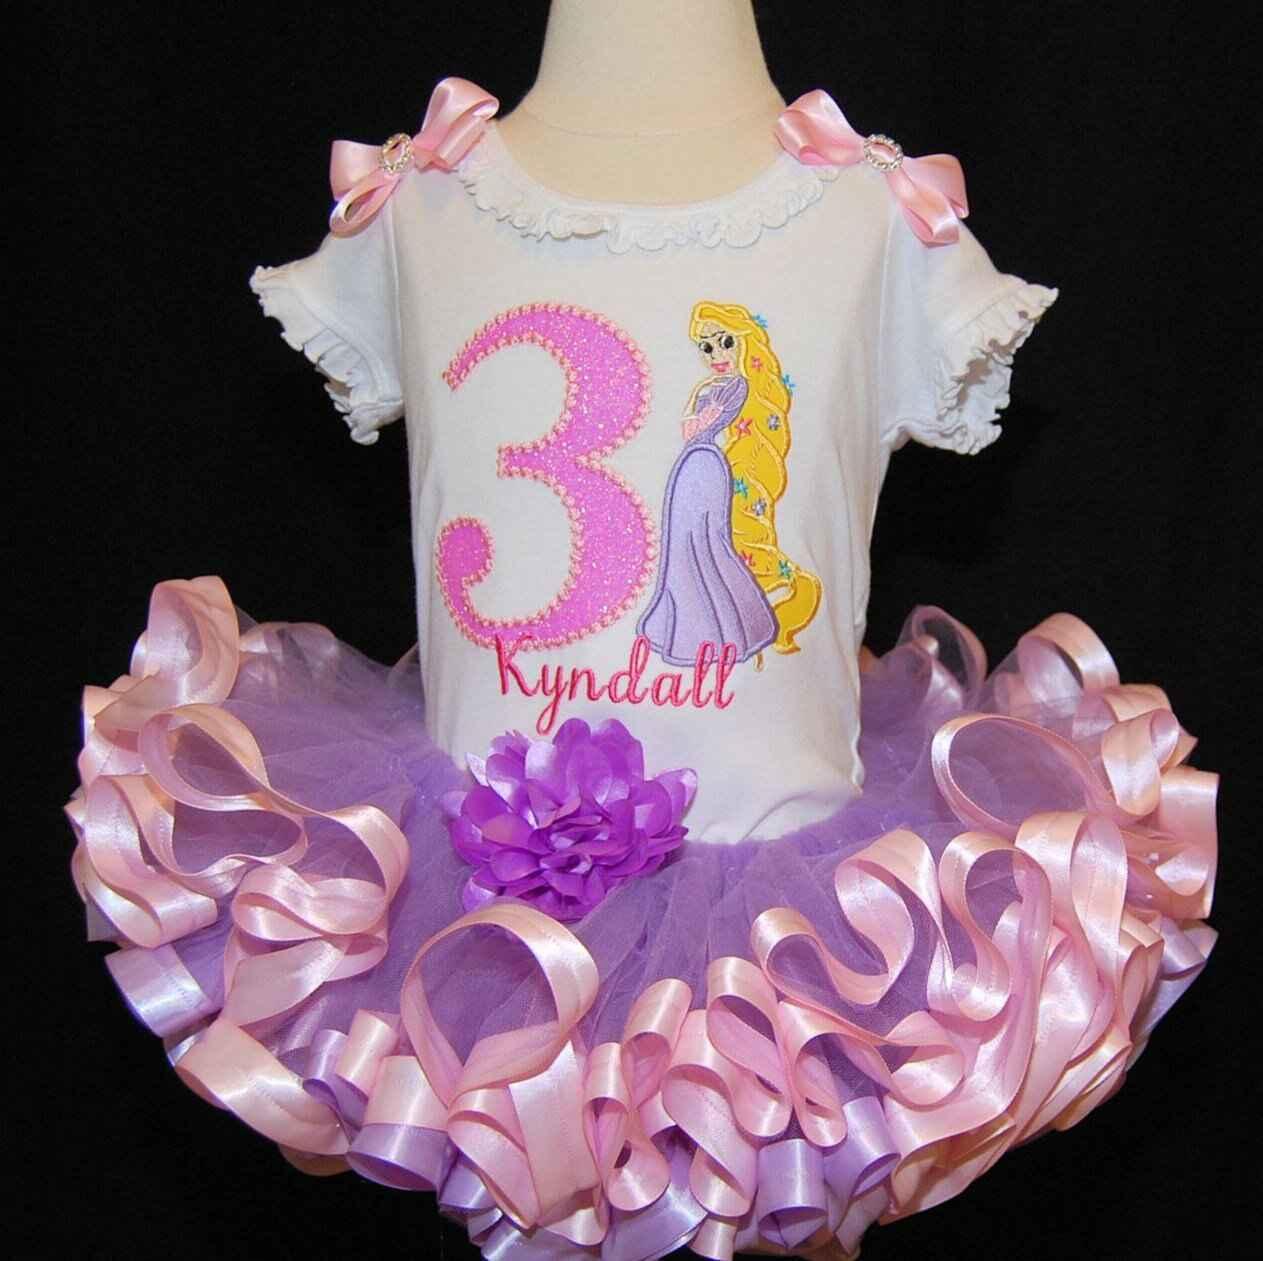 Princess Rapunzel 3rd Birthday Outfit, princess birthday tutu, birthday tutu, 3rd birthday outfit, tutu dress, birthday tutu outfit, tutu